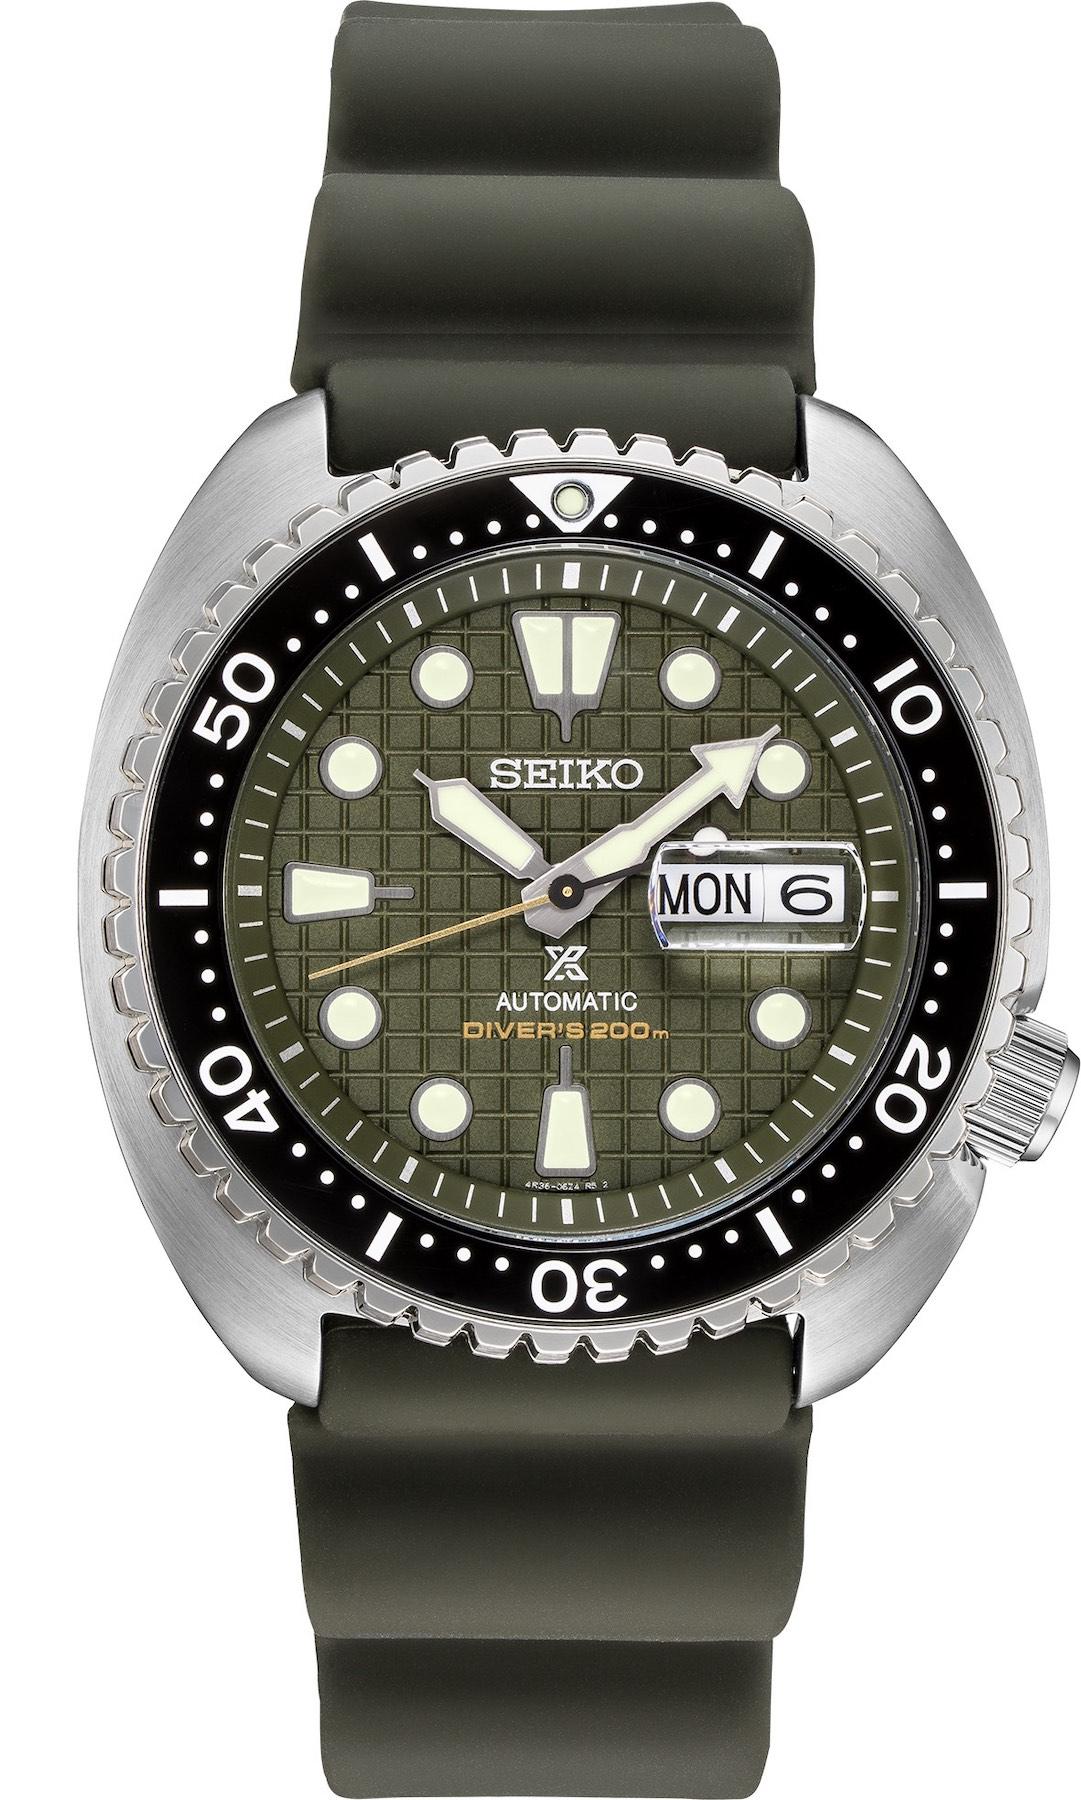 Seiko Prospex Automatic Diver 200m - Seiko King Turtle SRPE05 SRPE05K1